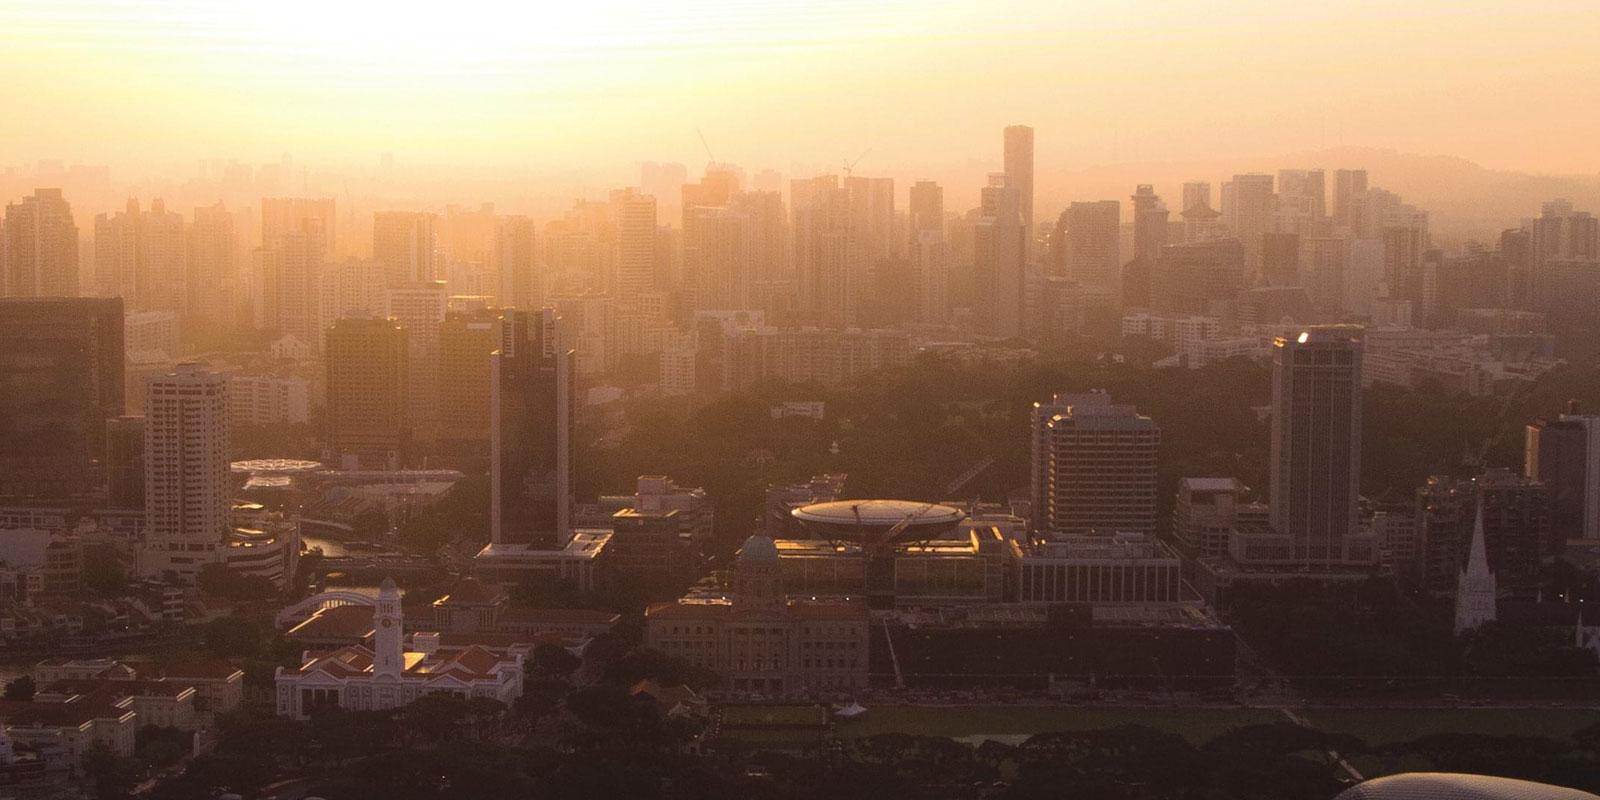 Singapore to Bangkok on the Eastern & Oriental Express